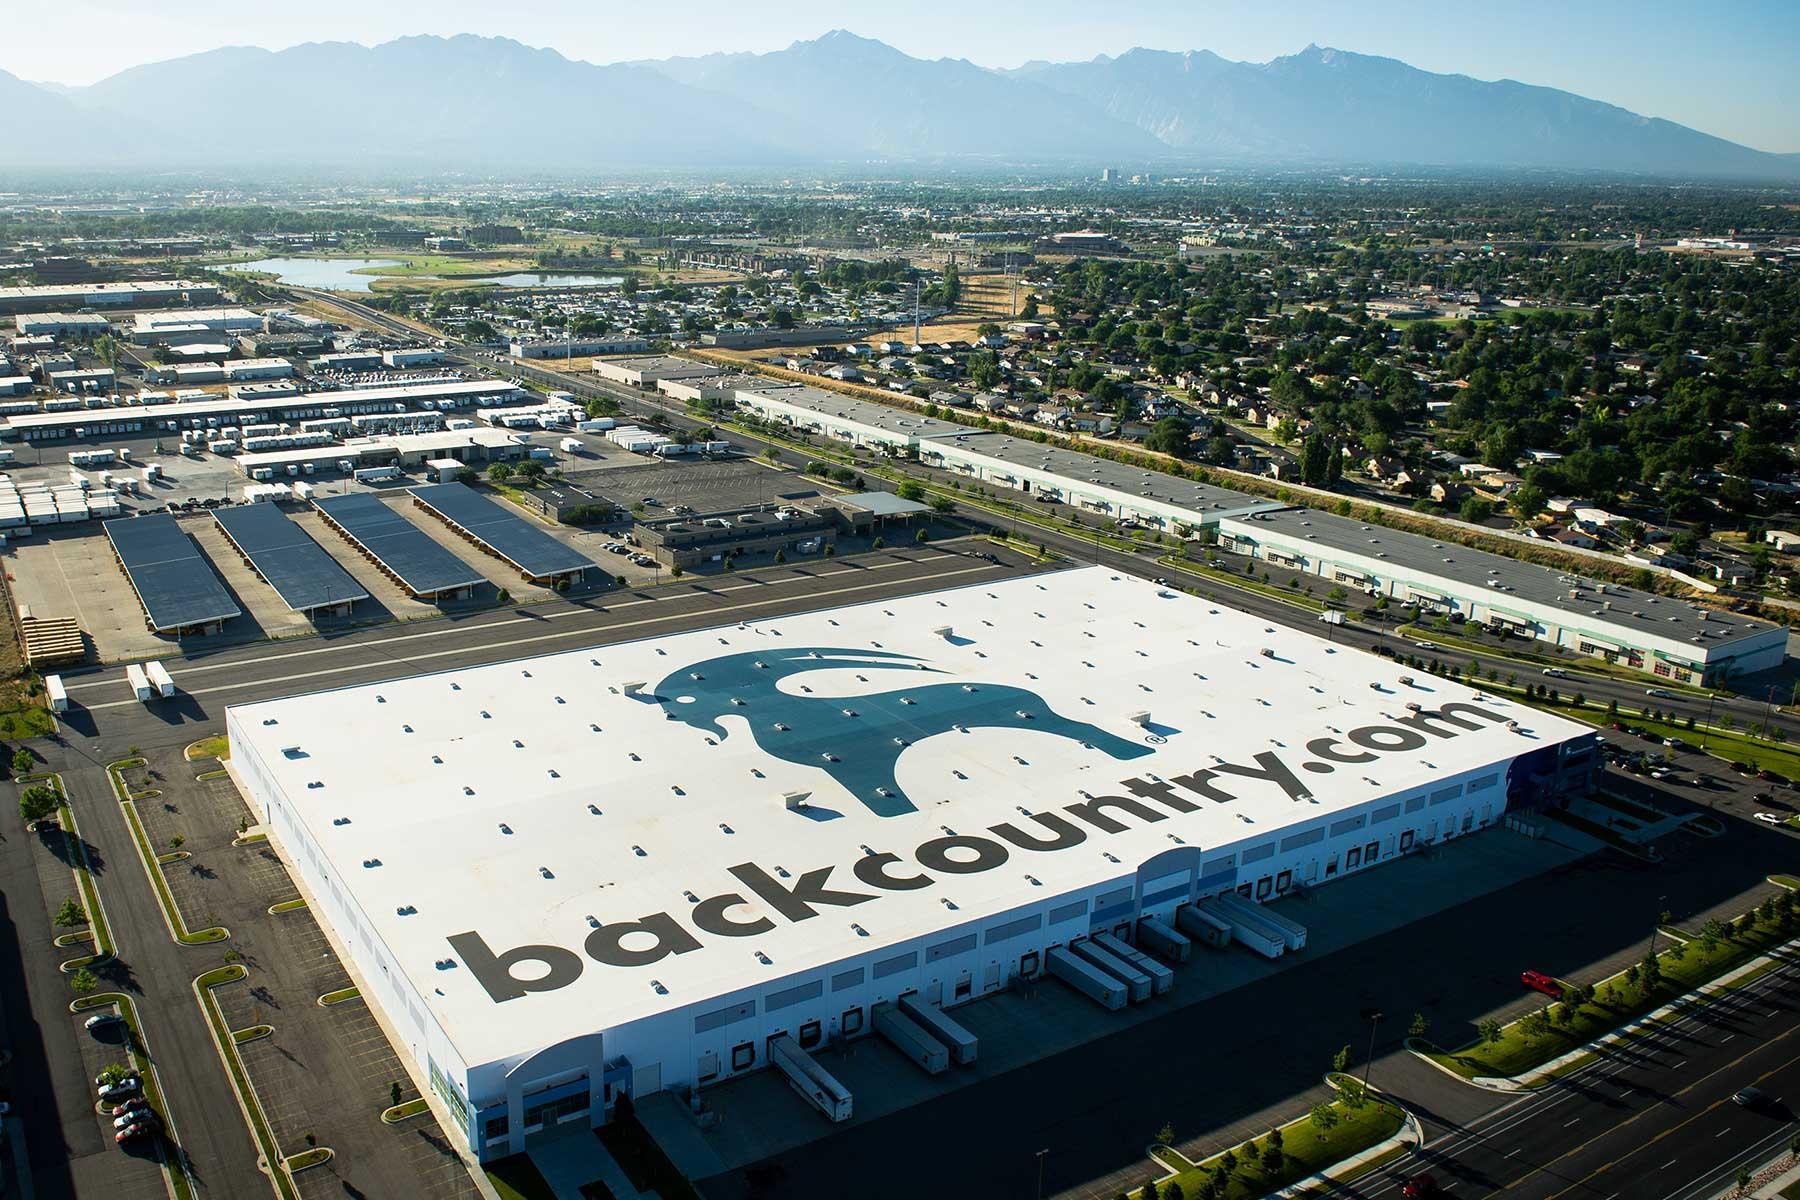 Client: Backcountry.com Salt Lake City, Utah